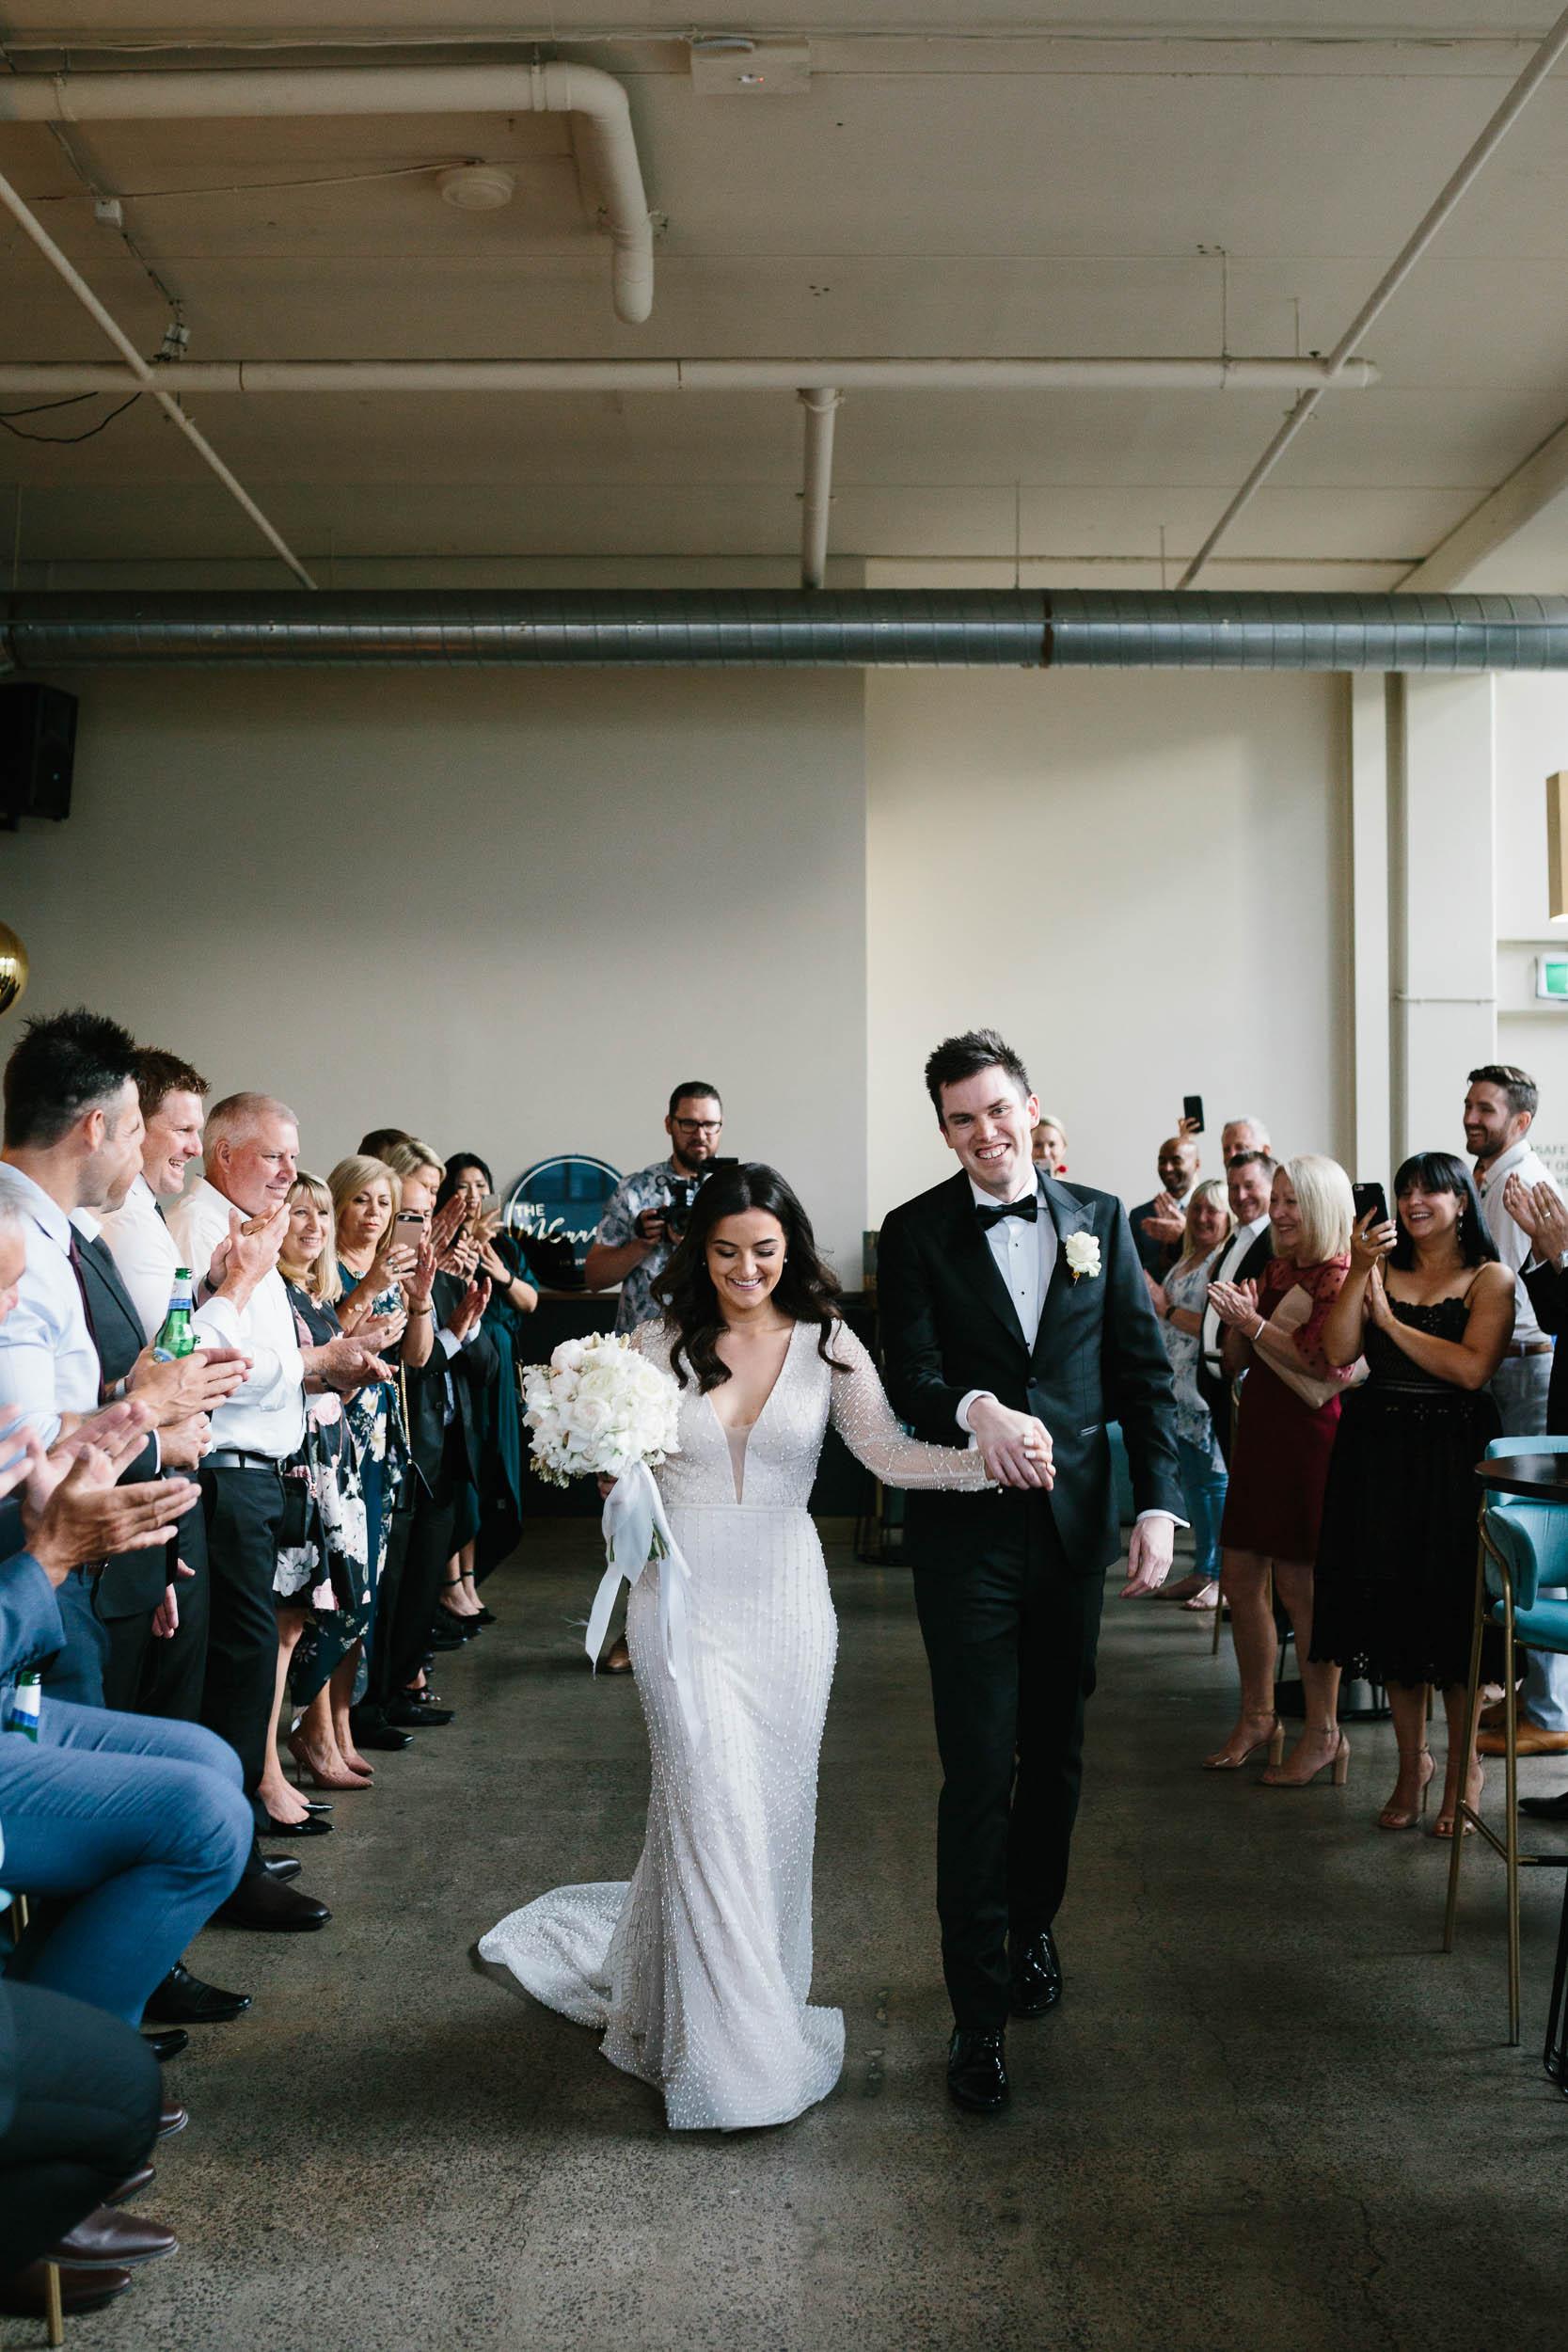 Kas-Richards-Wedding-Photographer-Melbourne-City-Wedding-Alto-Event-Space-Jane-Hill-Bridal-Gown-53.jpg